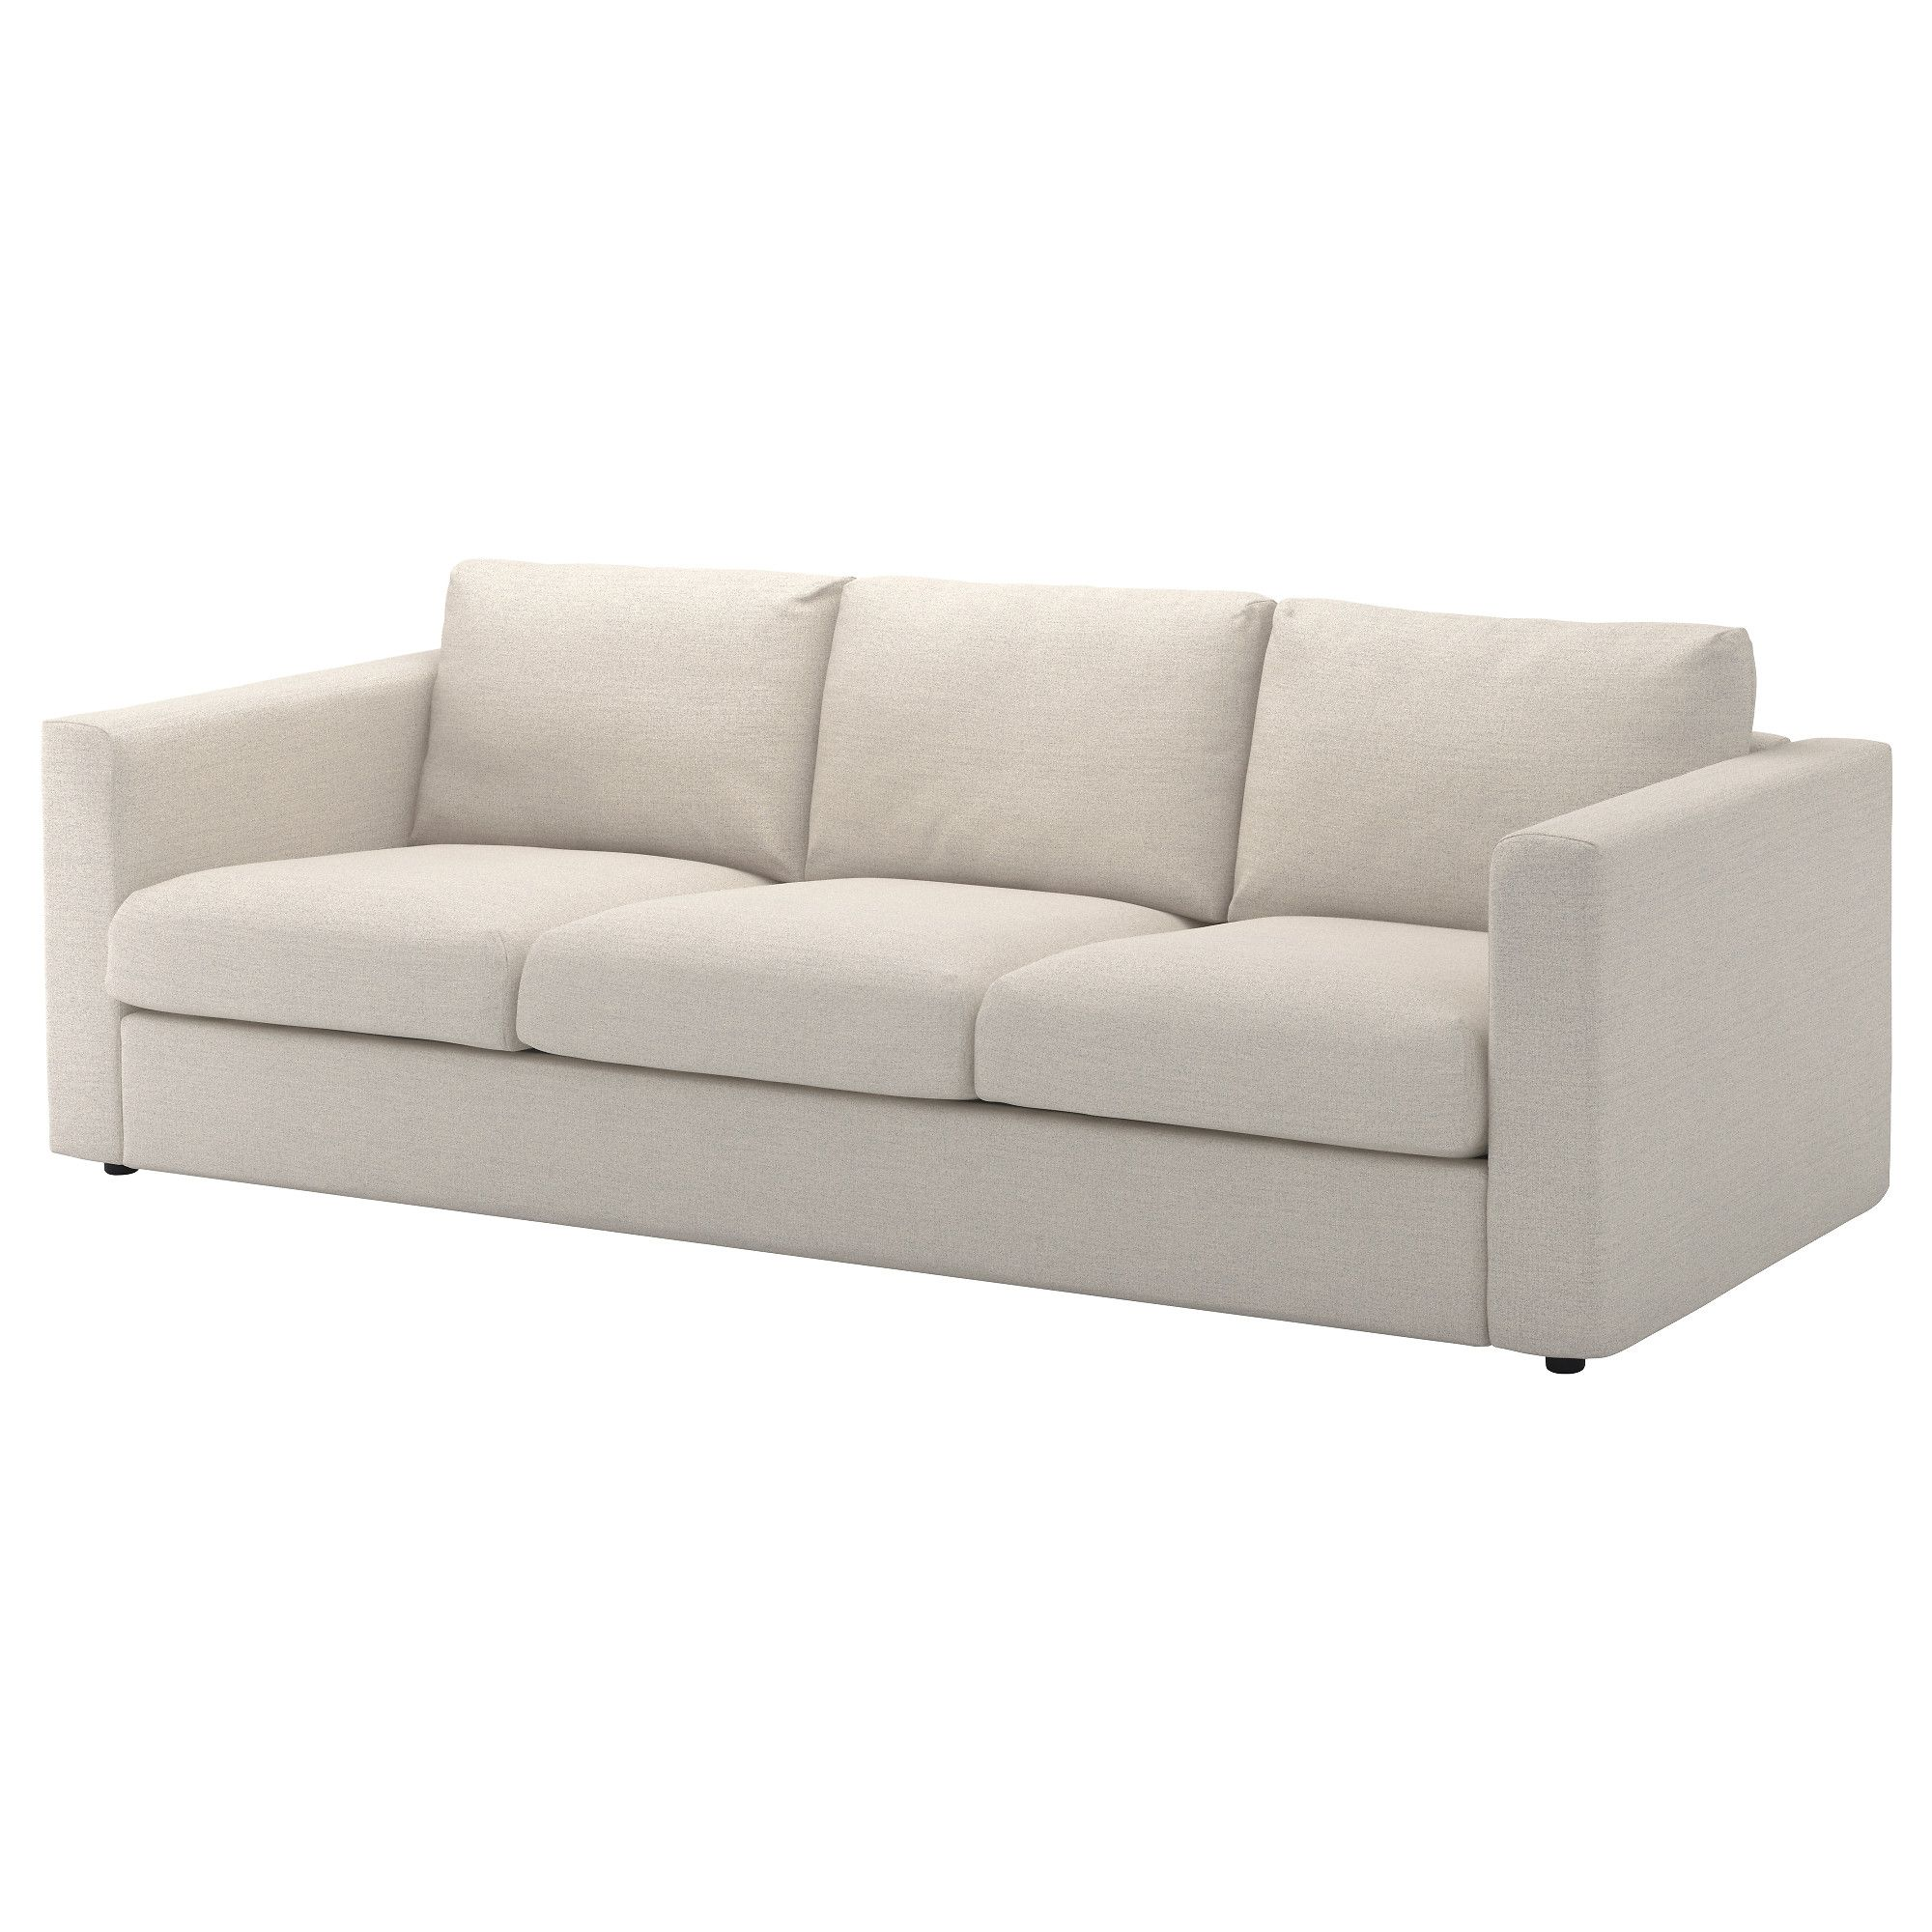 Us Furniture And Home Furnishings Sofa 3 Lugares Tecido Para